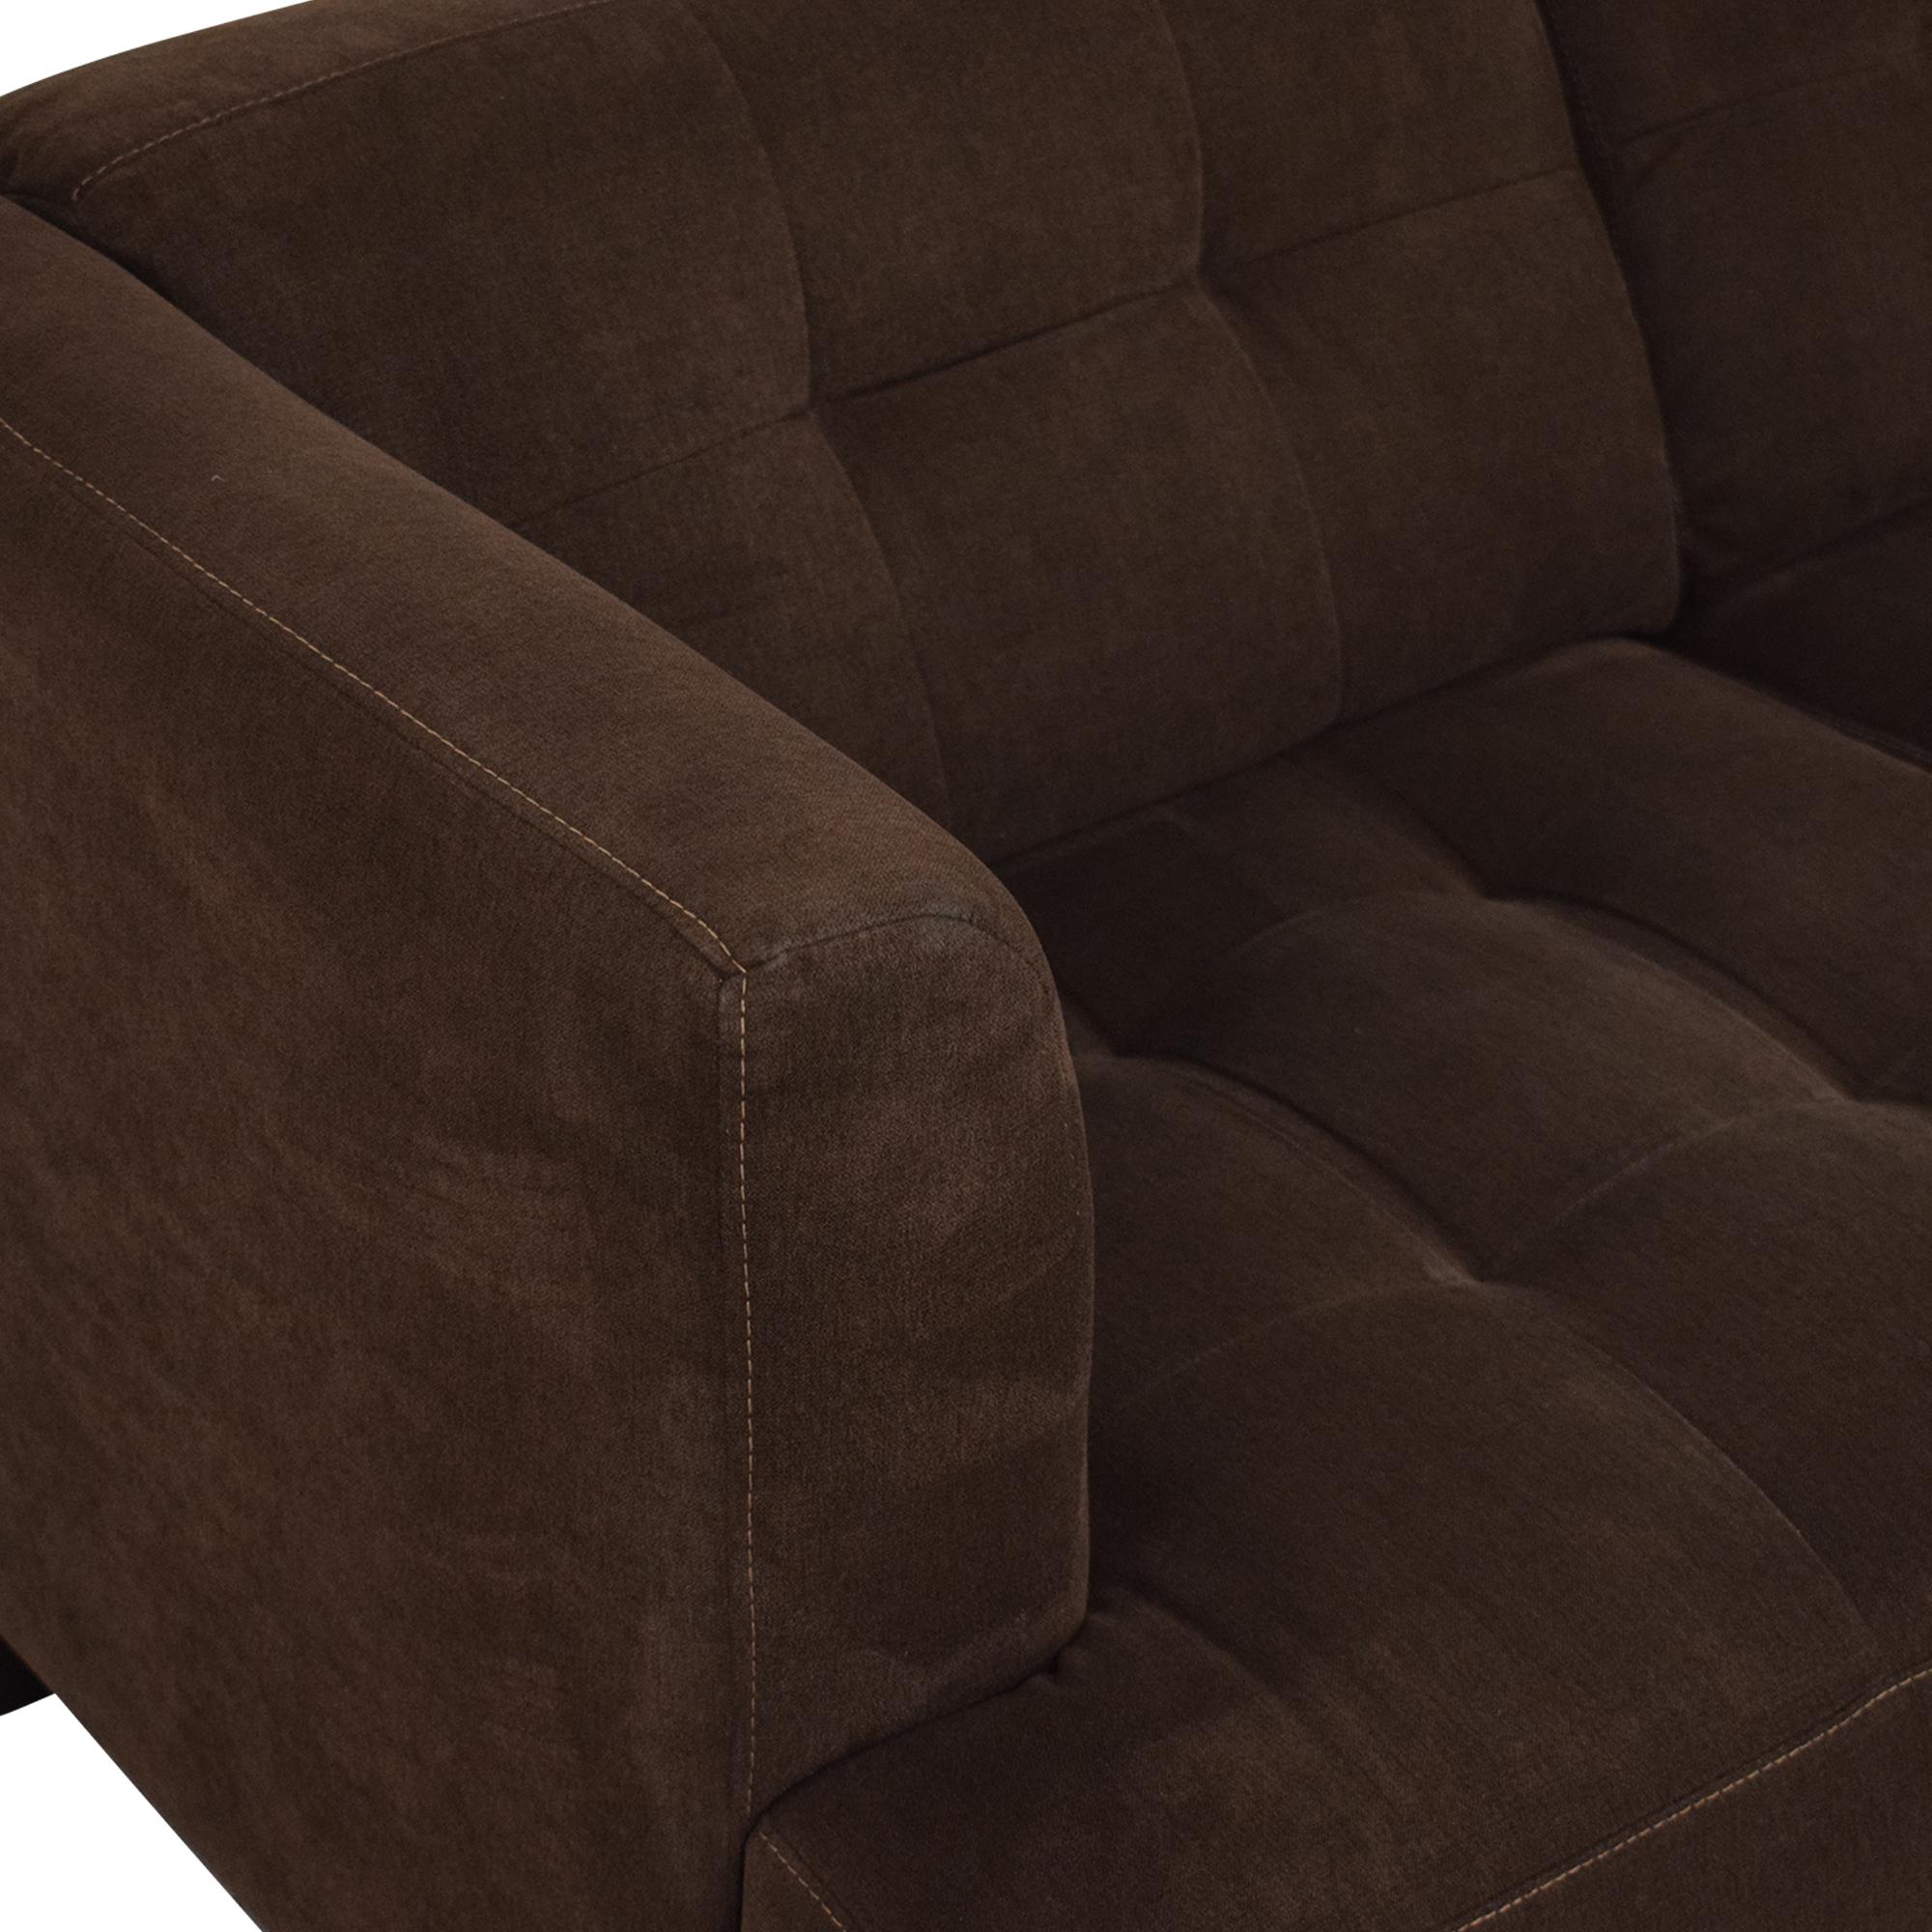 Macy's Macy's Jonathan Louis Three Cushion Sofa on sale